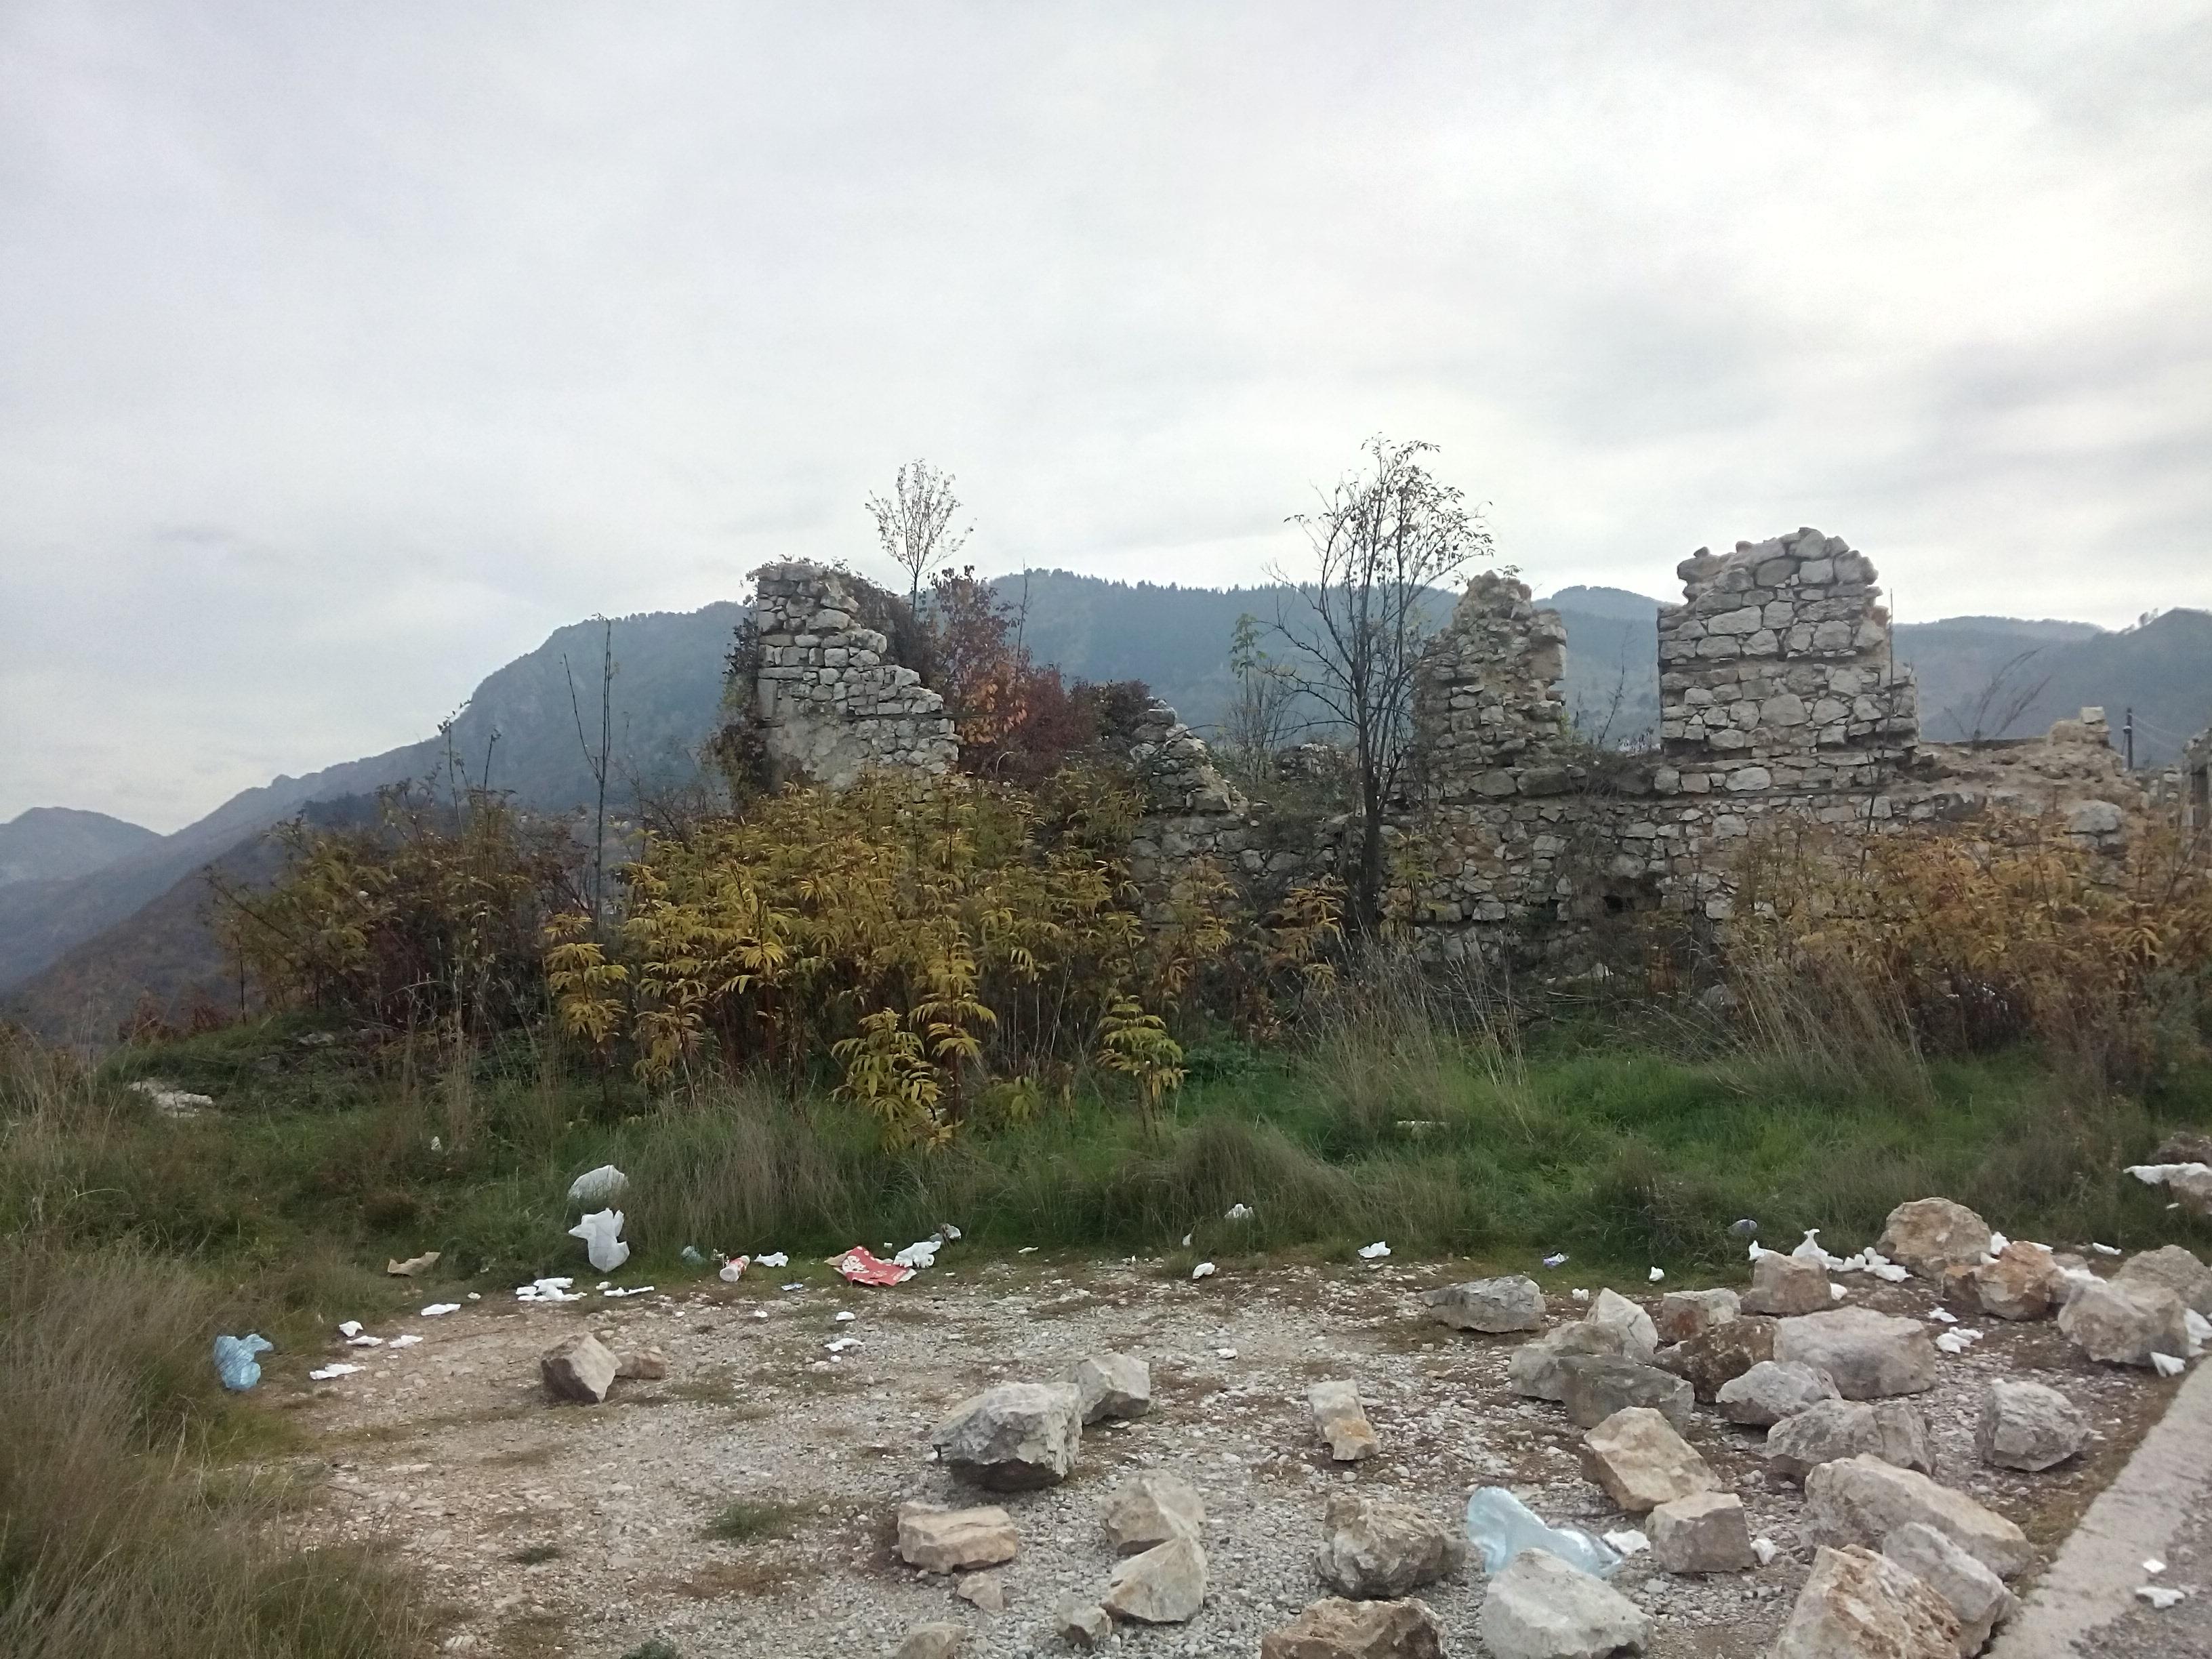 https://i.amy.gy/2017-sarajevo/IMG_20171022_140959_1.jpg